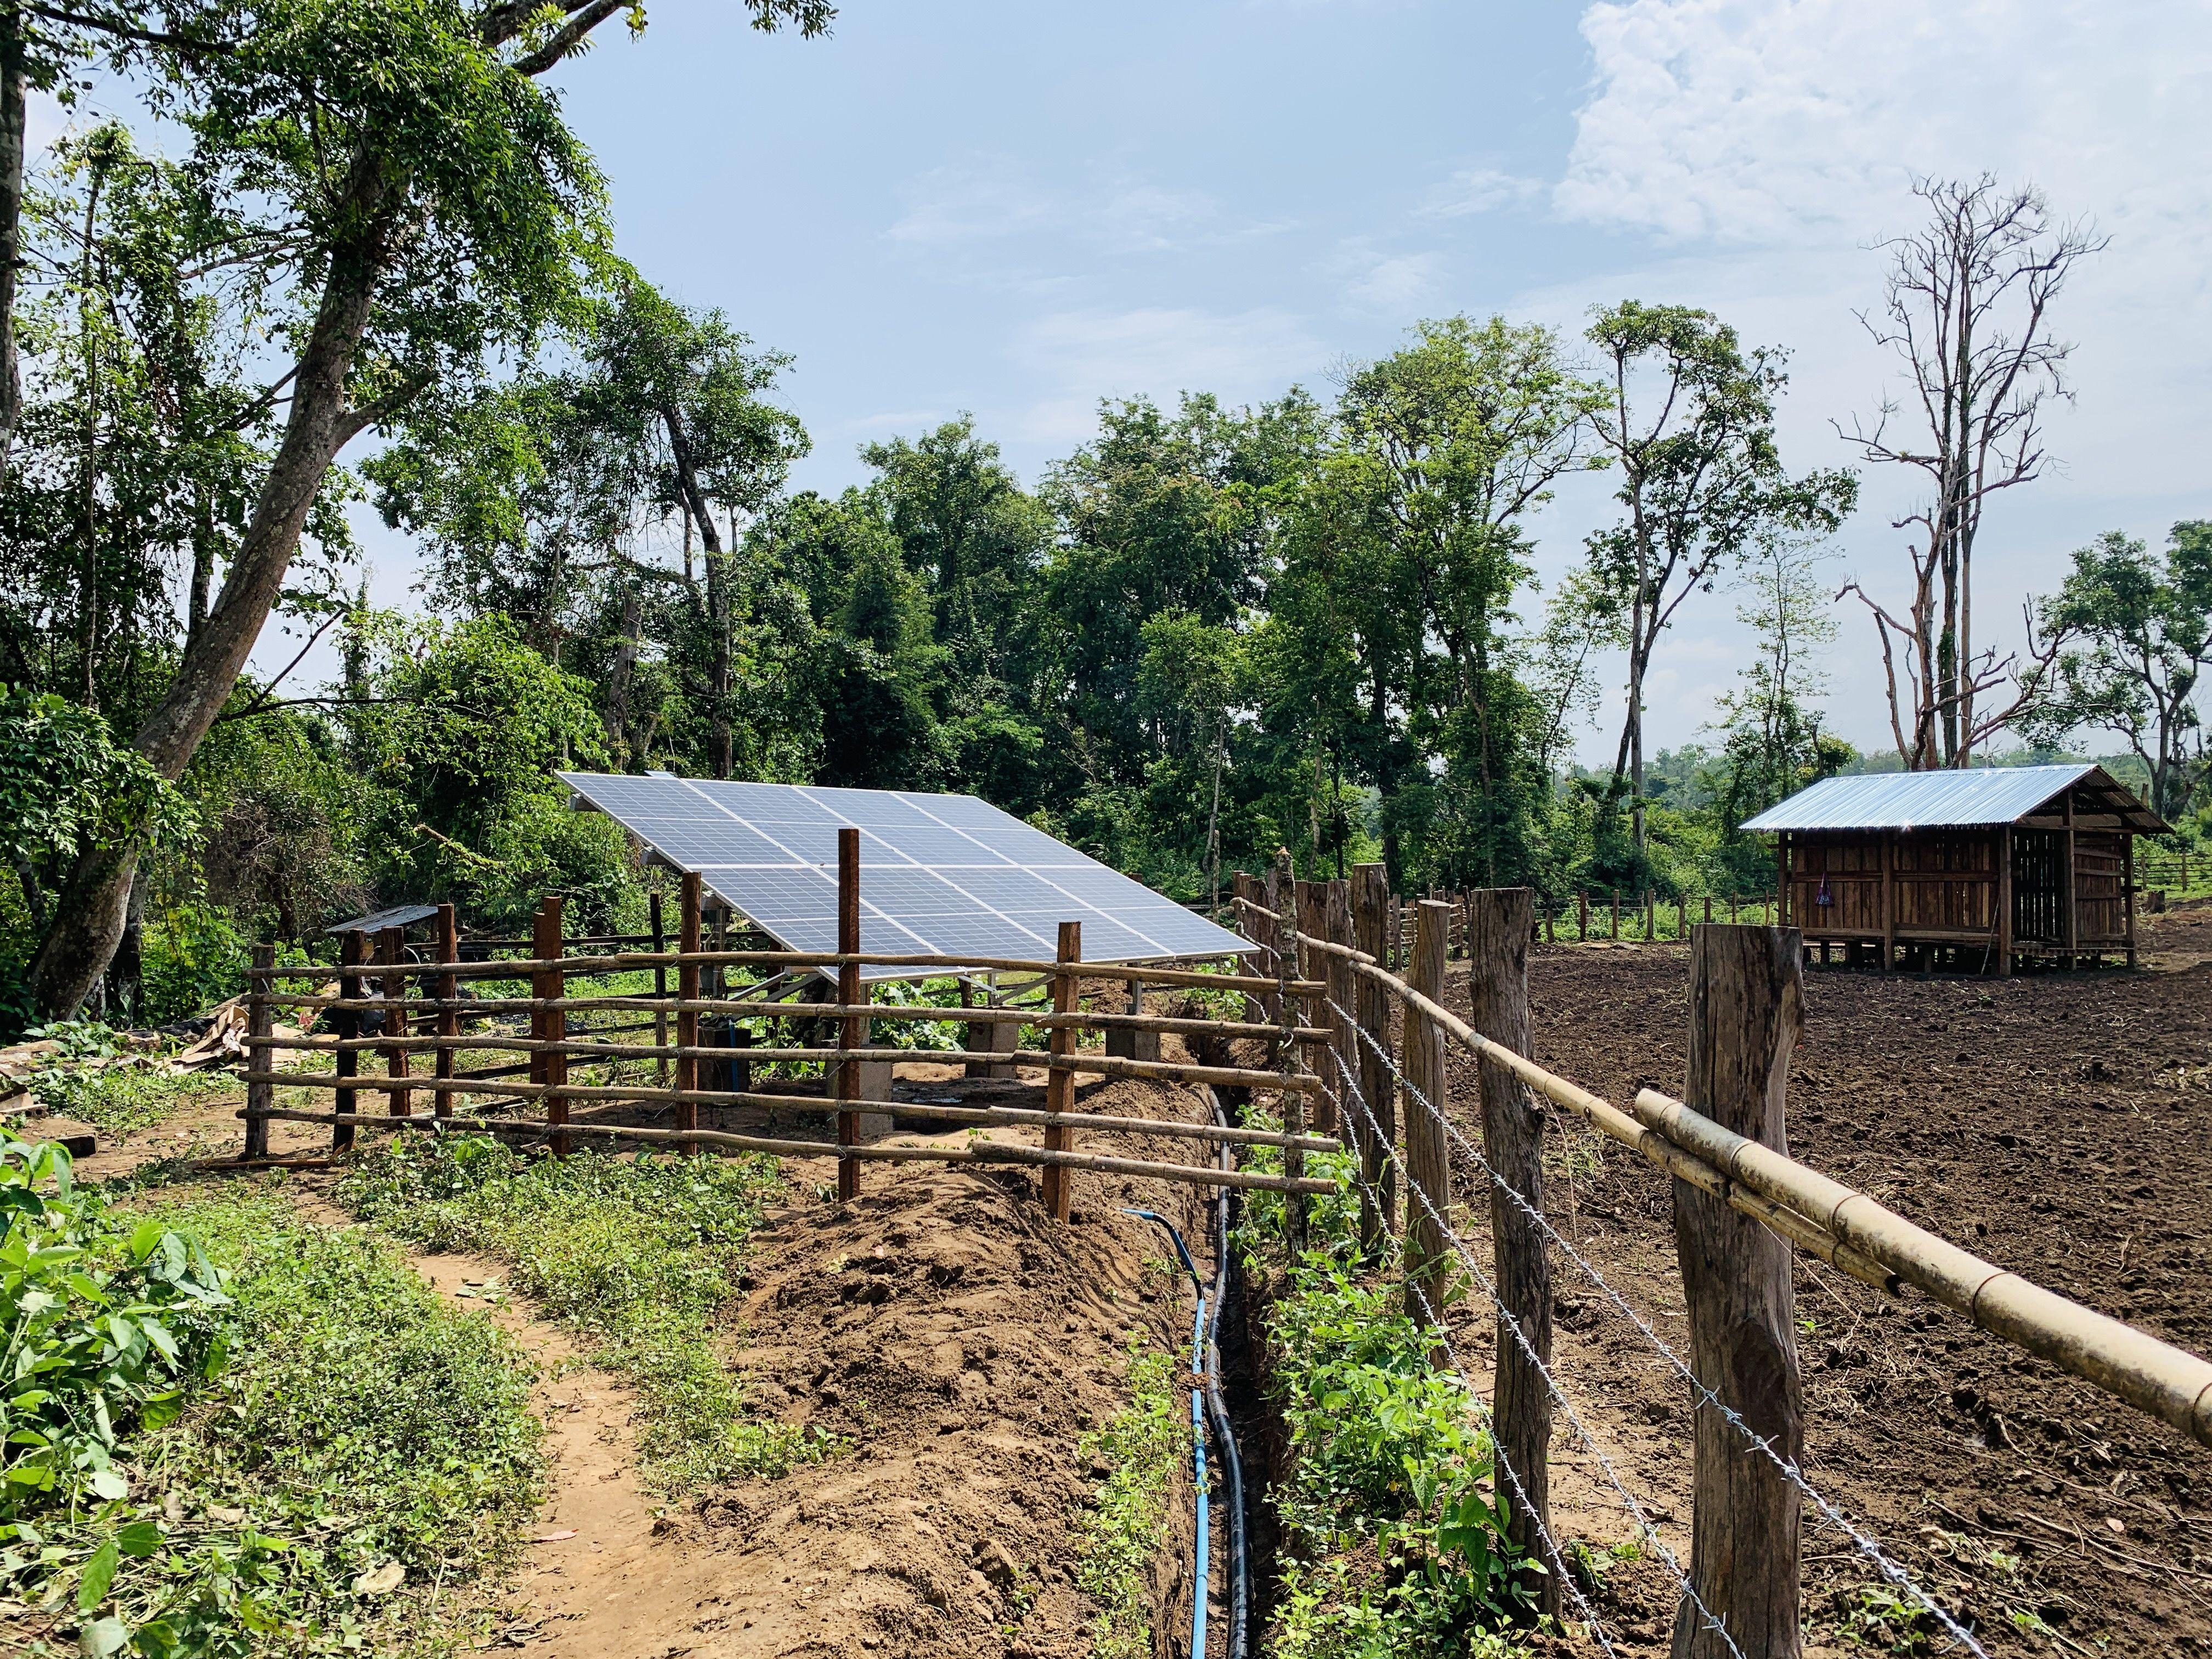 Kyain Kham Village, Nansang Tsp, Myanmar, June 2021